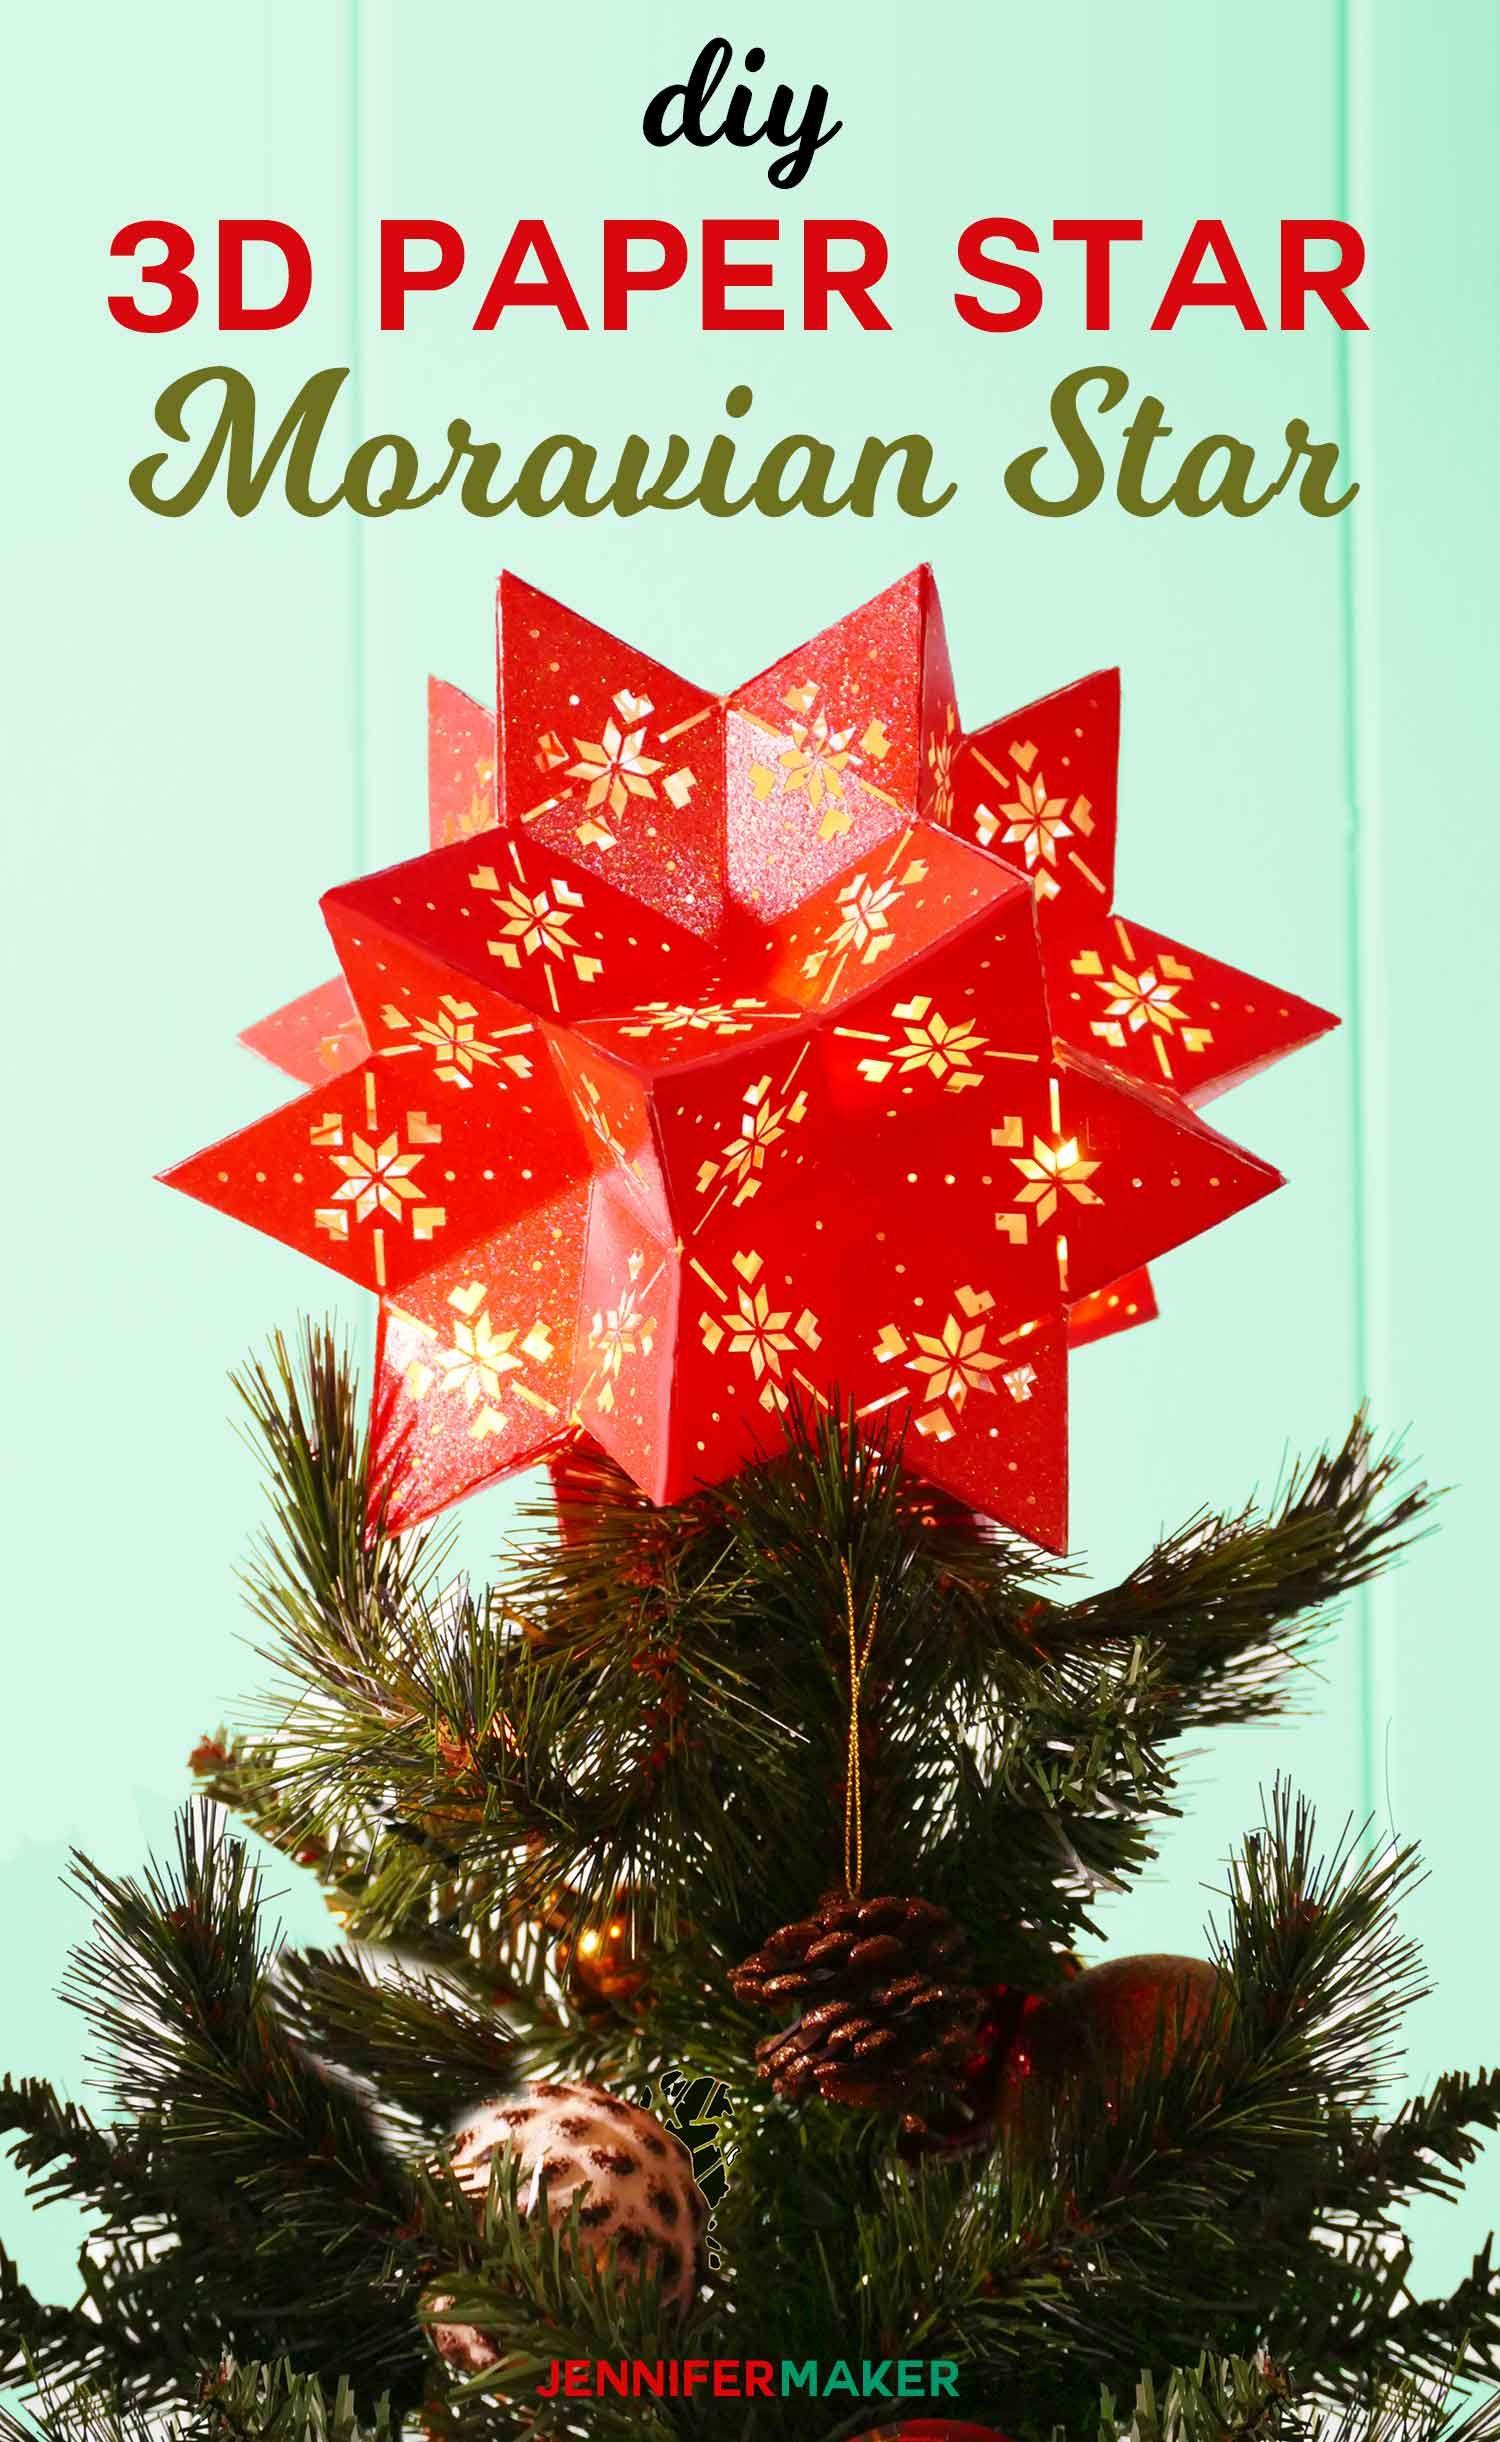 Diy 3d Paper Star Moravian 20 Point Tree Topper Jennifer Maker Diy Tree Topper 3d Paper Star Paper Christmas Tree